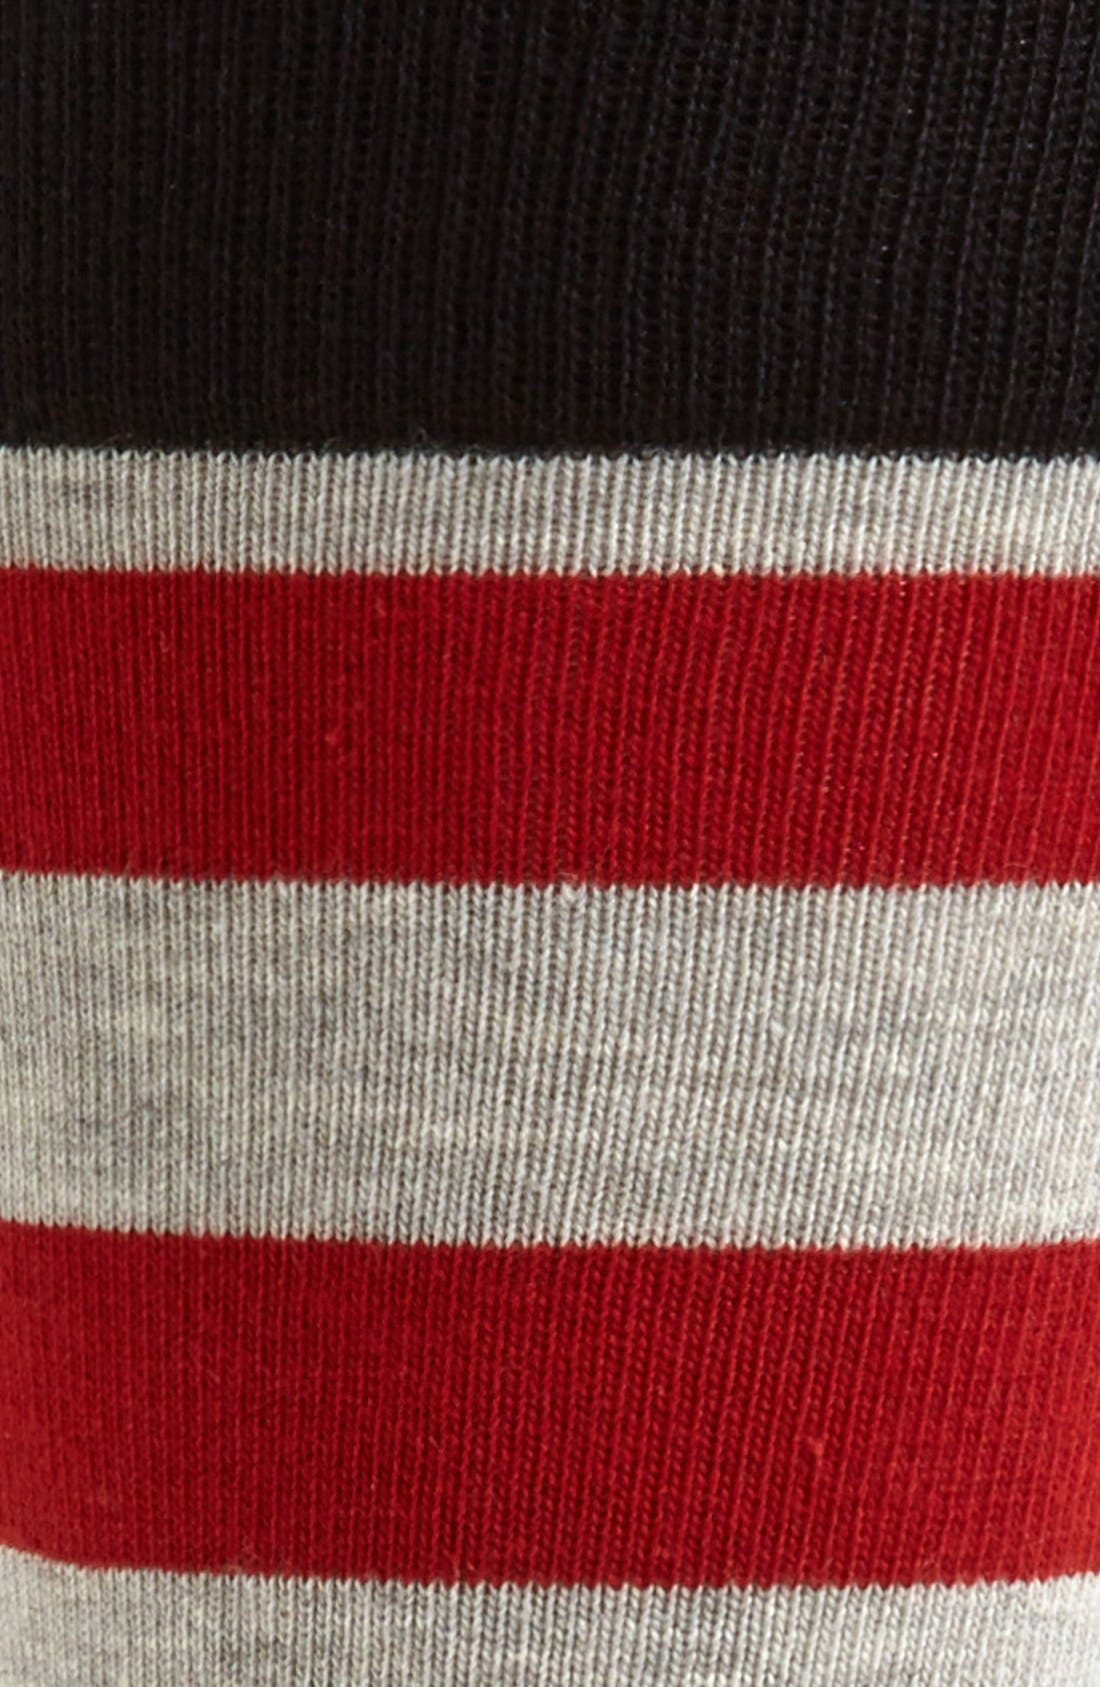 Alternate Image 2  - Happy Socks Patterned Socks